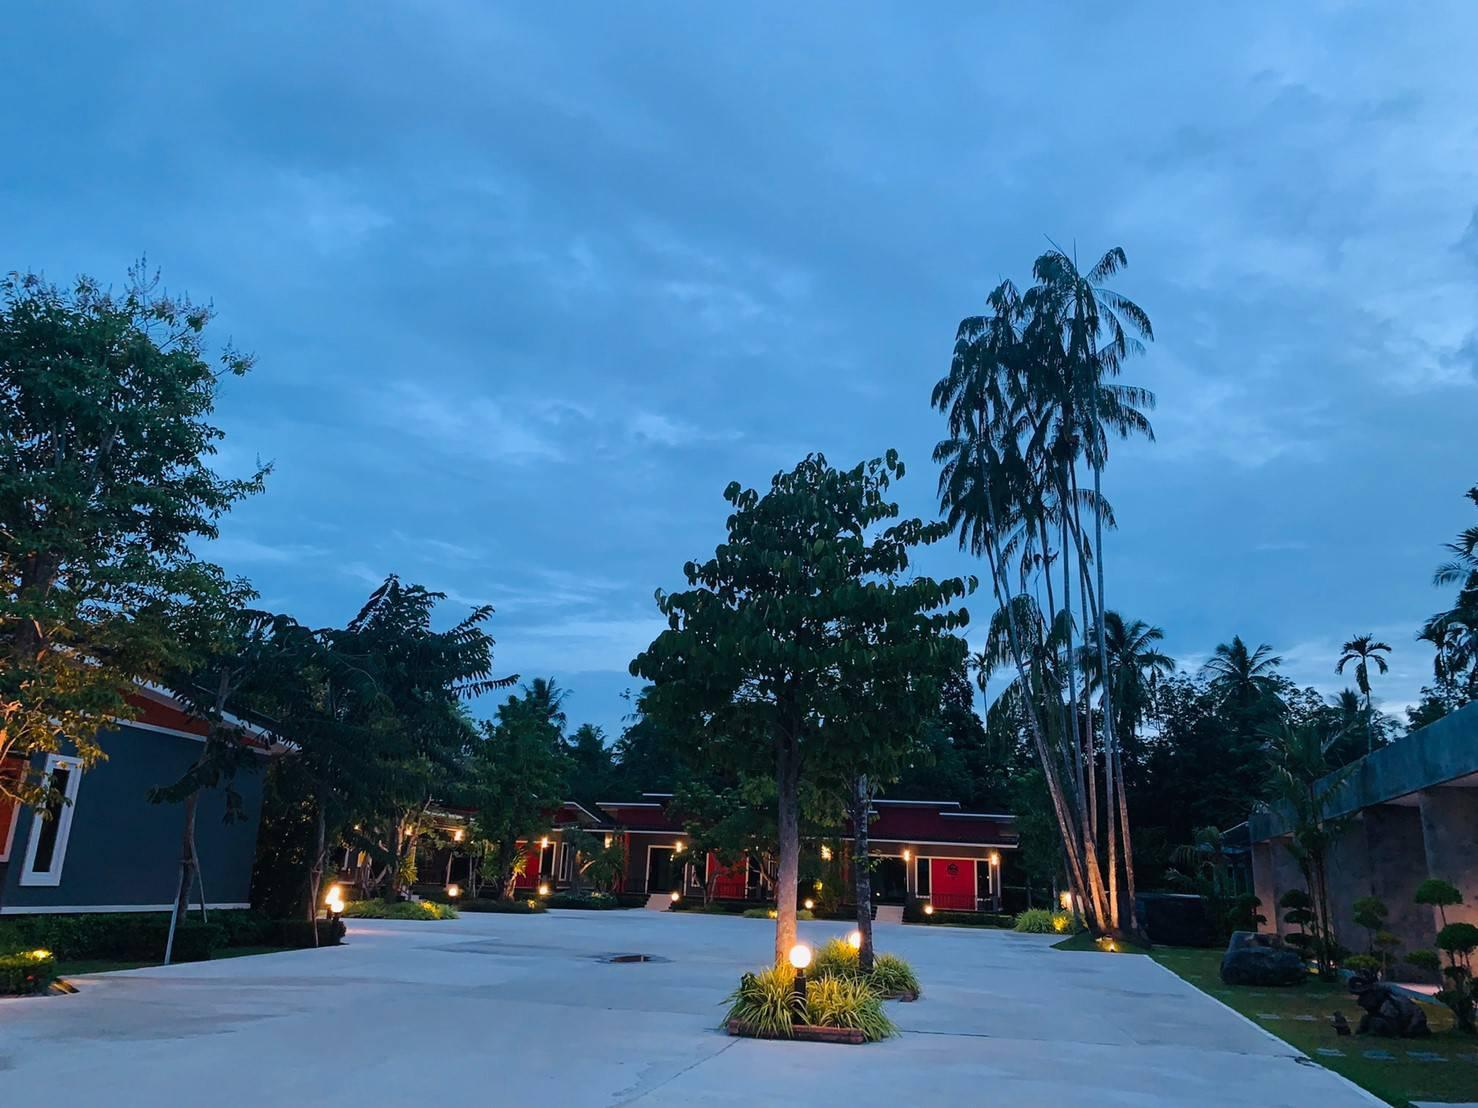 Chang Puak Resort Ronphiboon Nakornsrithamarat ช้างเผือกรีสอร์ต ร่อนพิบูลย์ นครศรีธรรมราช